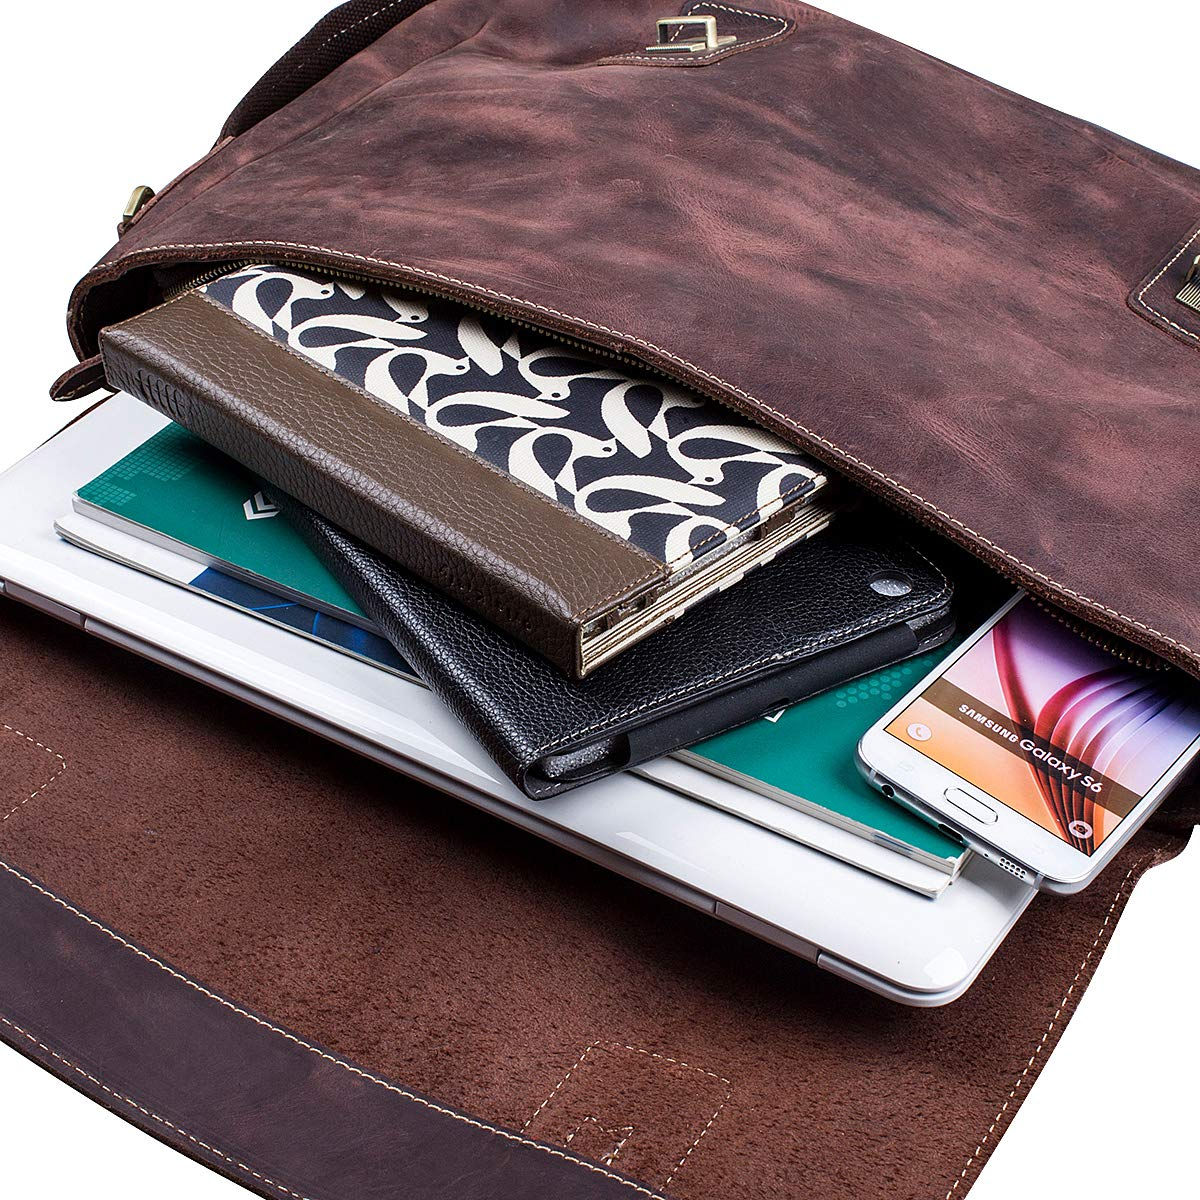 S-ZONE Men's Crazy Horse Leather Satchel Briefcase Shoulder Bag Messenger Bag 14'' Laptop Tote Bag by S-ZONE (Image #5)